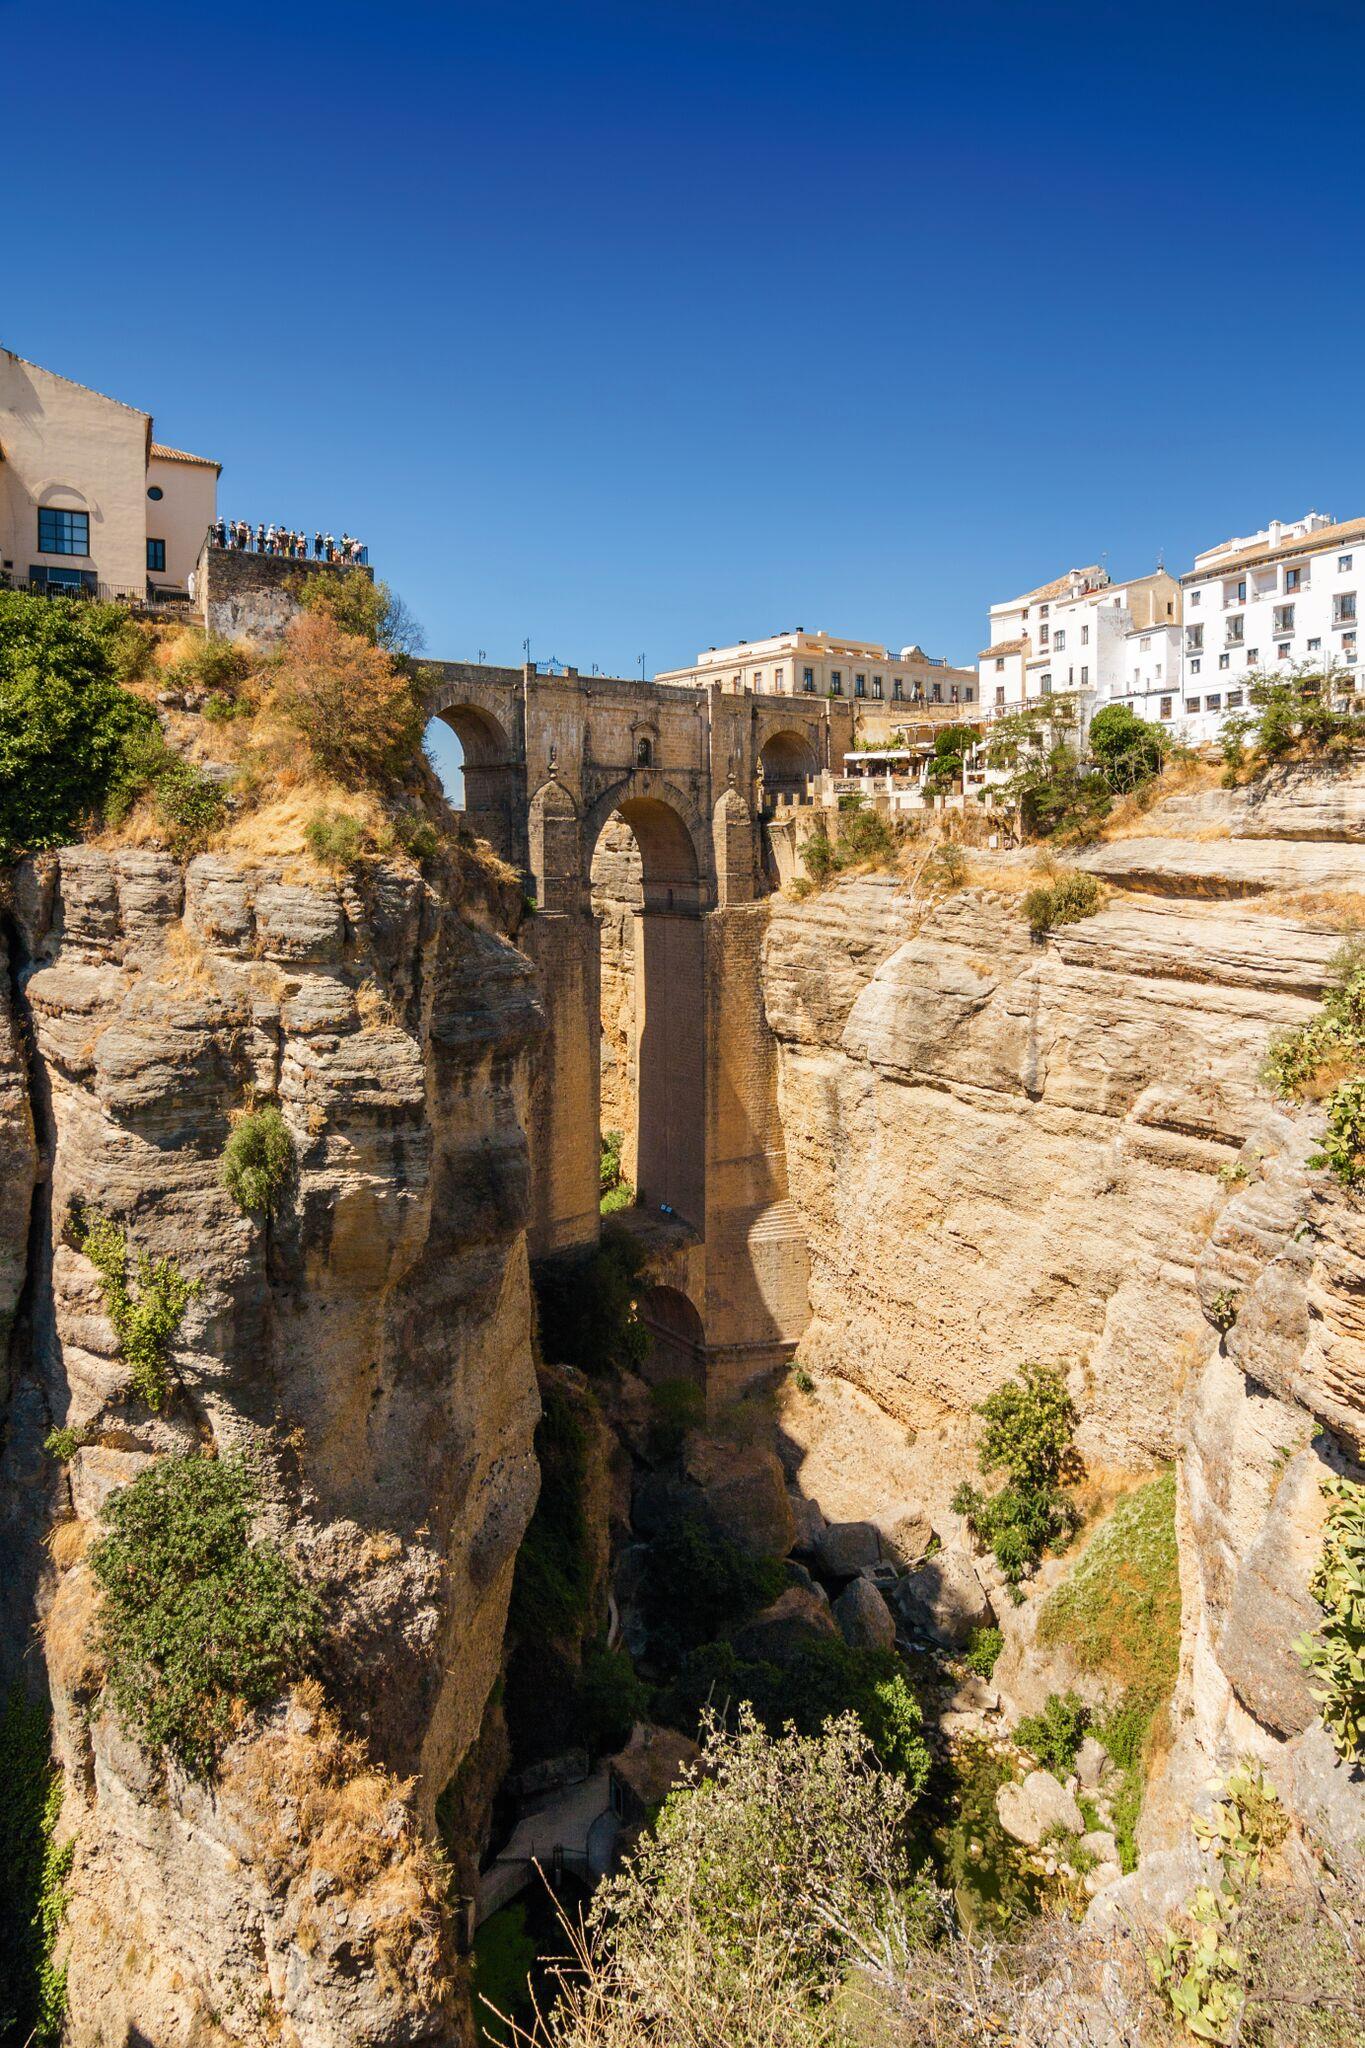 Andalusien-puente nuevo.jpg